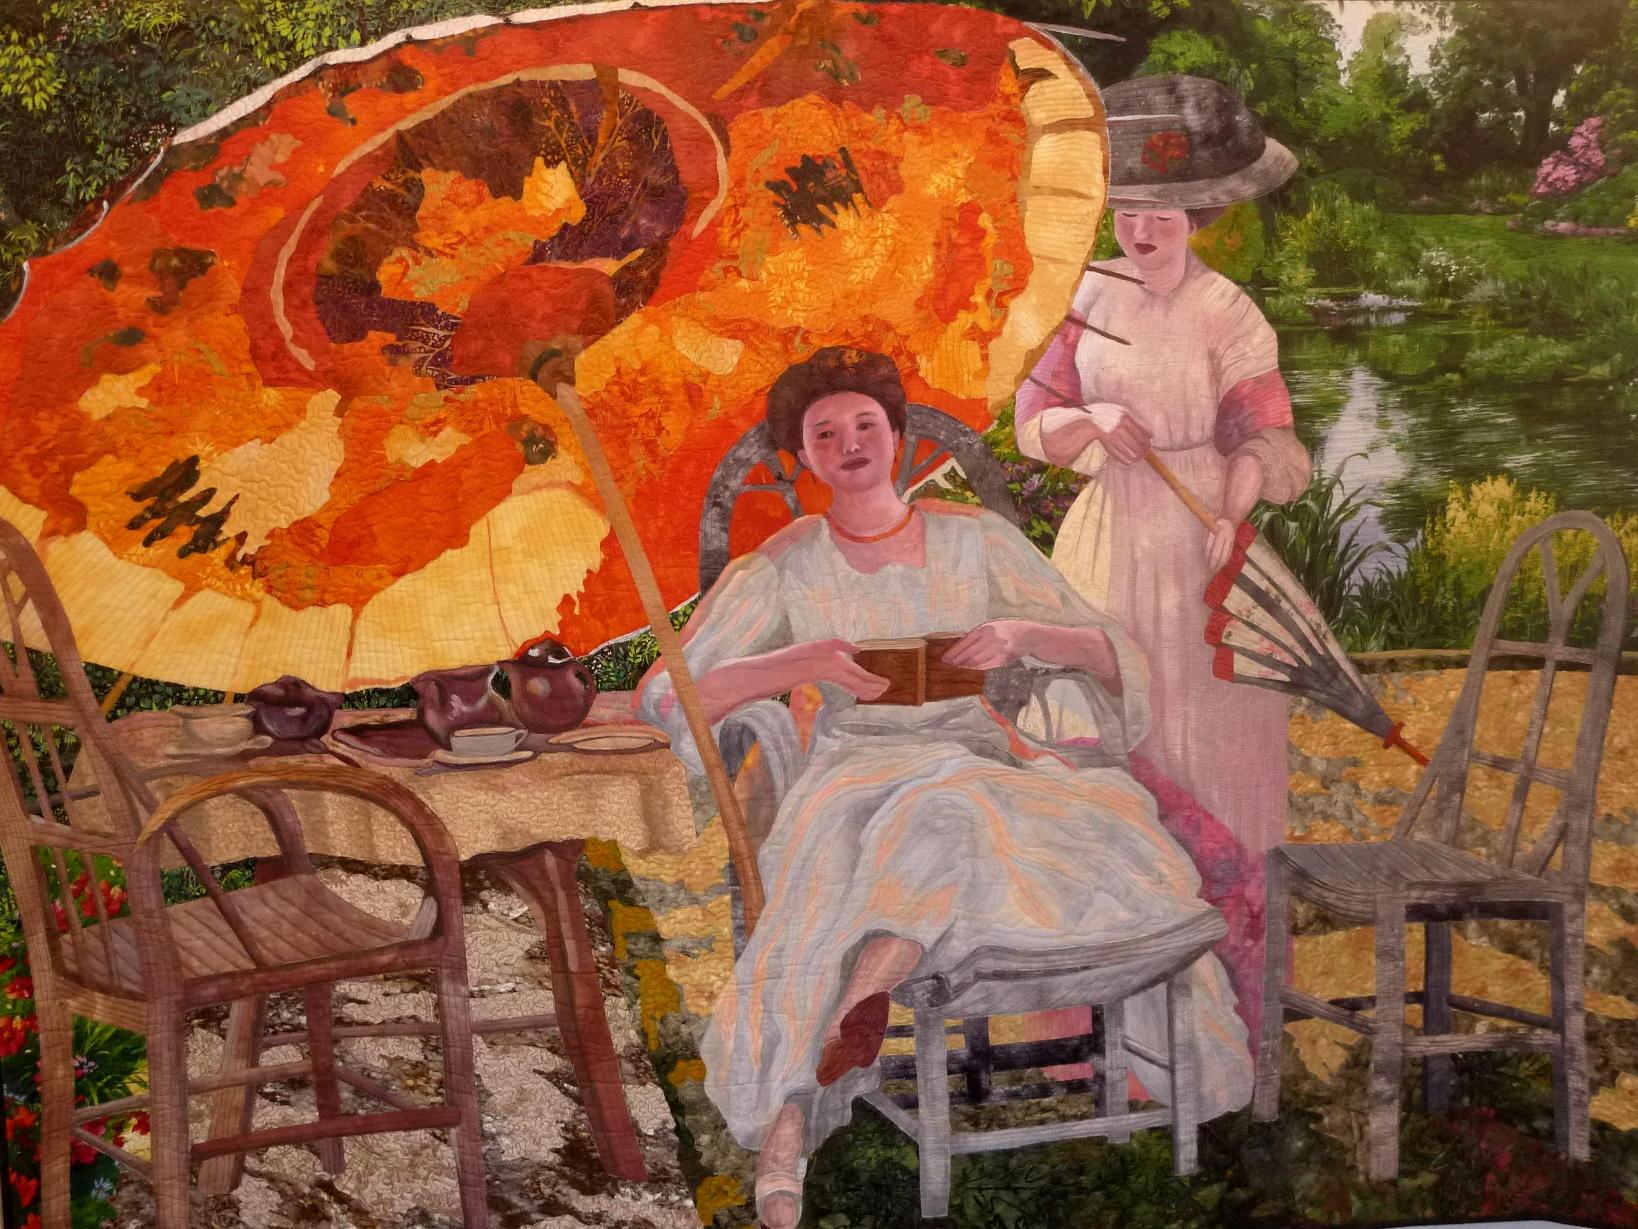 Art quilt de Leonore Crawford inspirado en un cuadro.